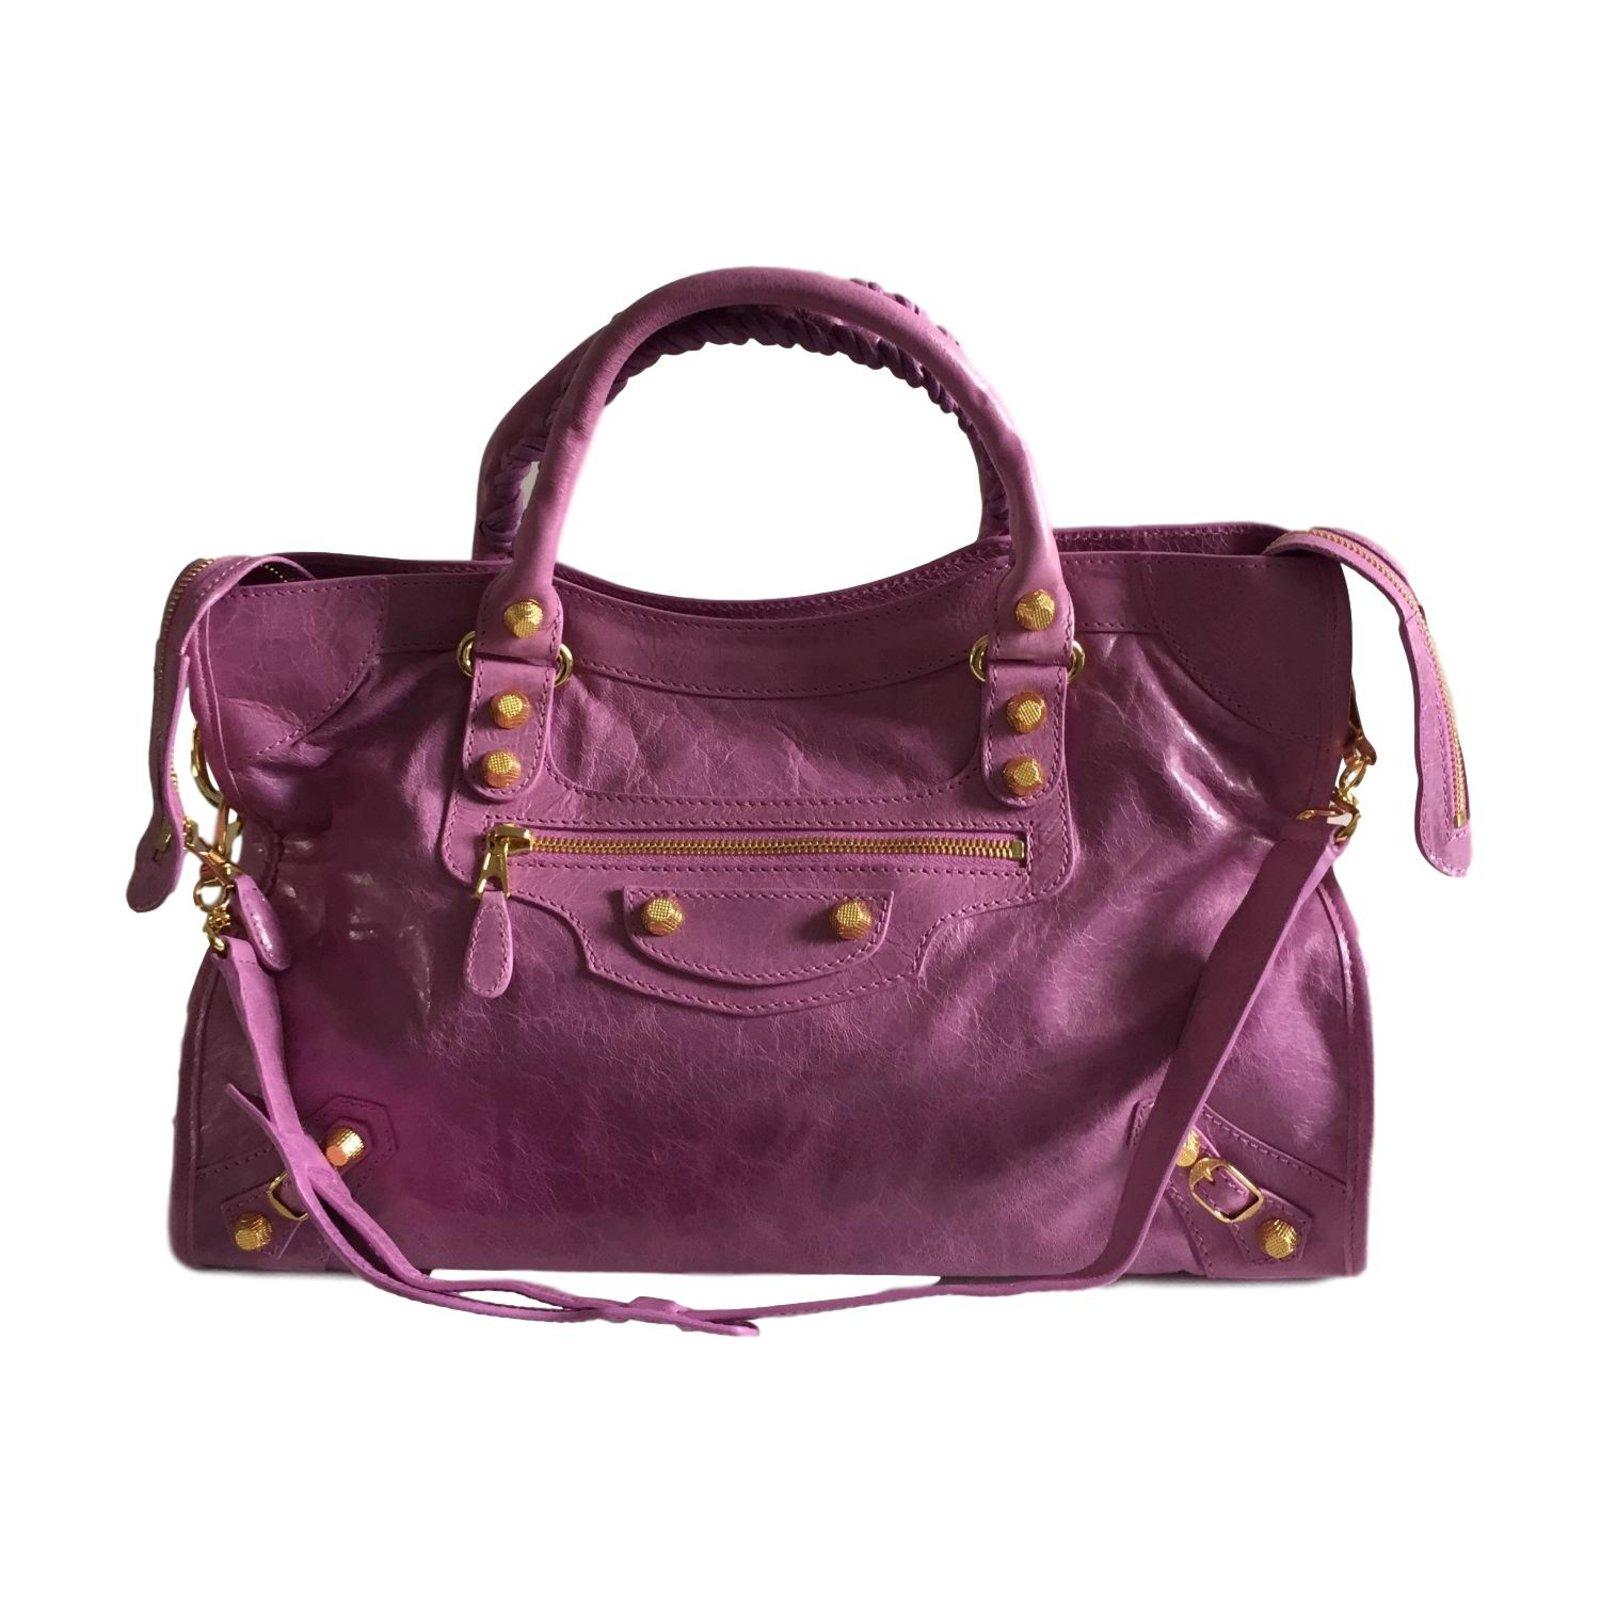 4059886450a8 Balenciaga City giant 12 gold Handbags Leather Pink ref.56752 - Joli ...